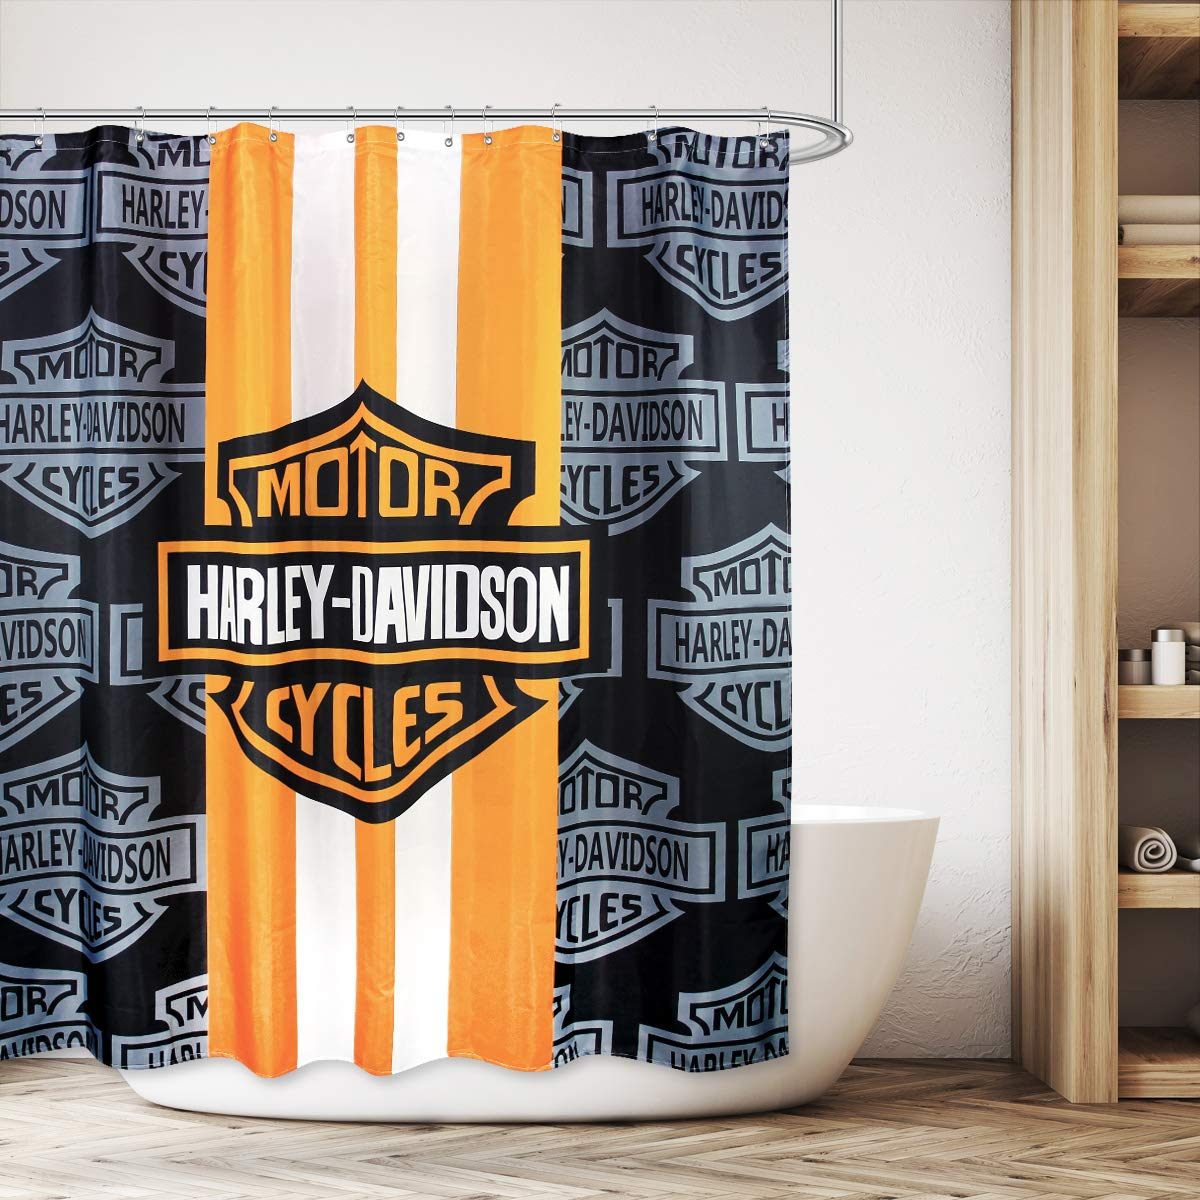 Cdcurtain Motorcycle Racing Waterproof Shower Curtain Jpg 1200x1200 Harley Davidson Hooks